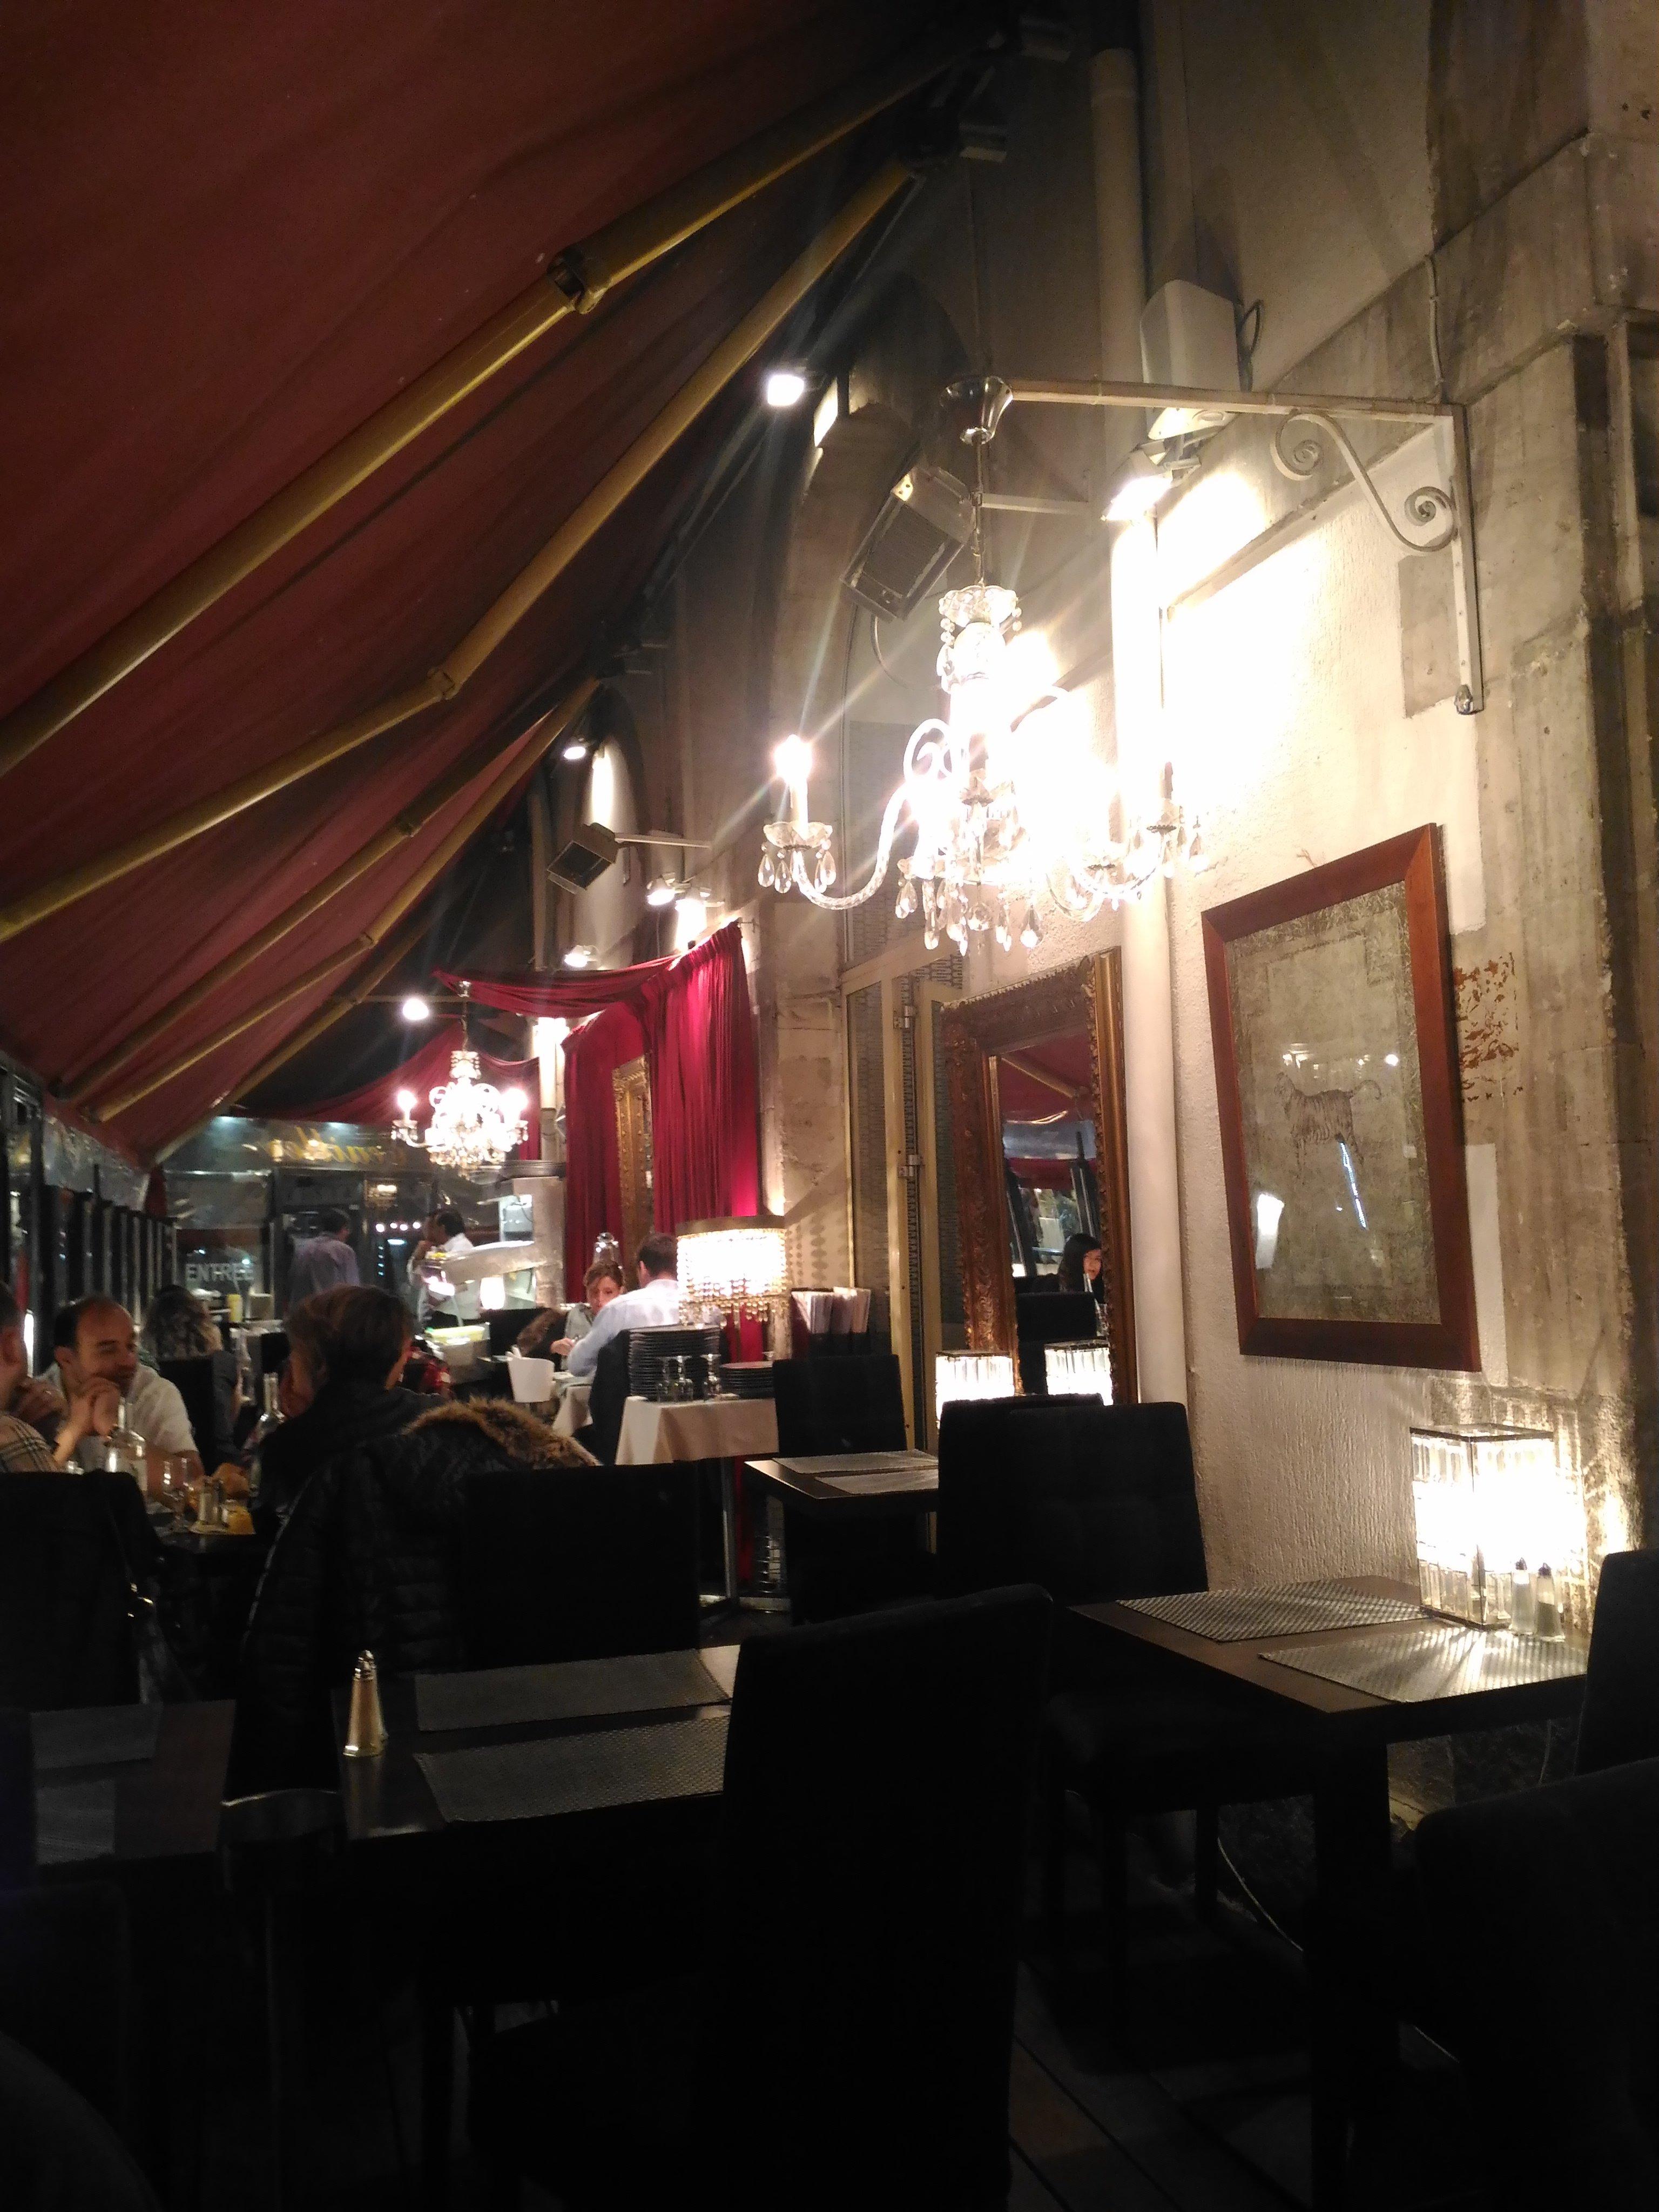 Chez laura marseille op ra restaurant reviews phone for Restaurant chez marie marseille